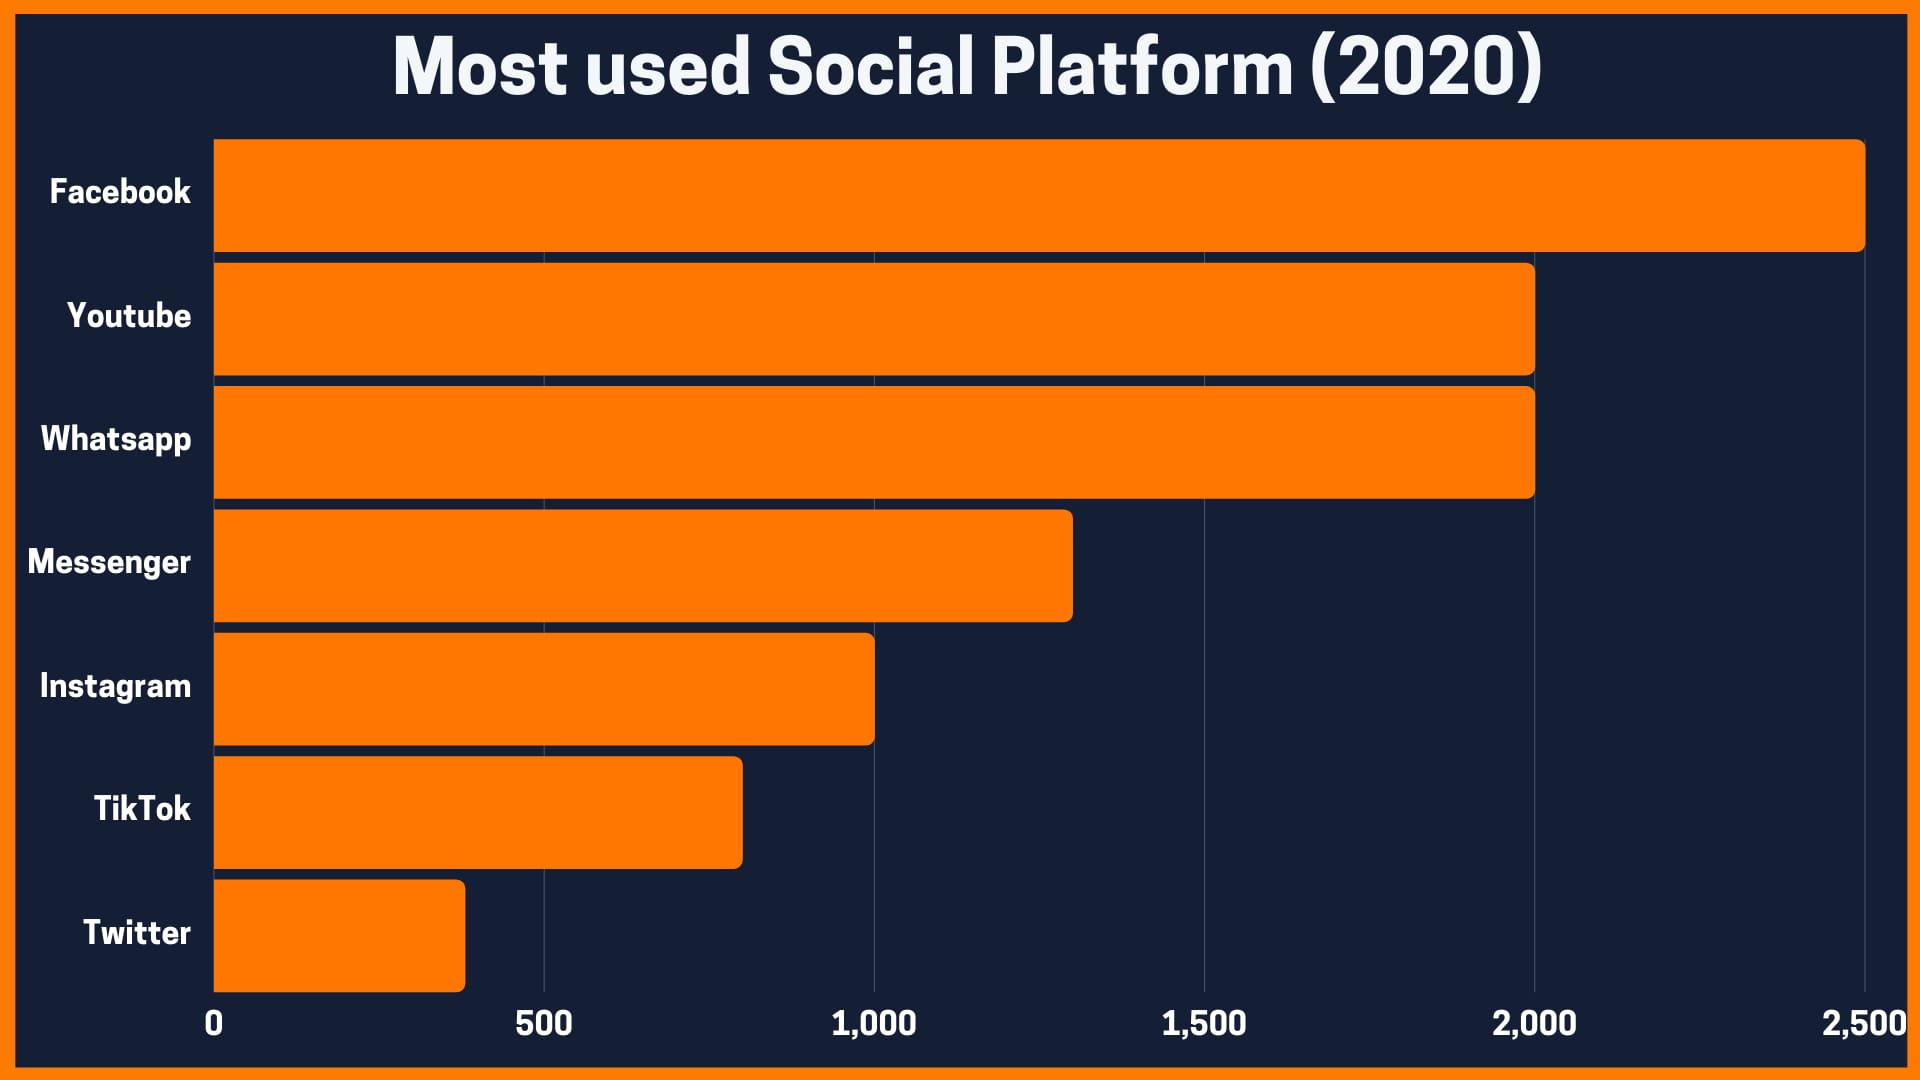 Most used Social Platform (2020)